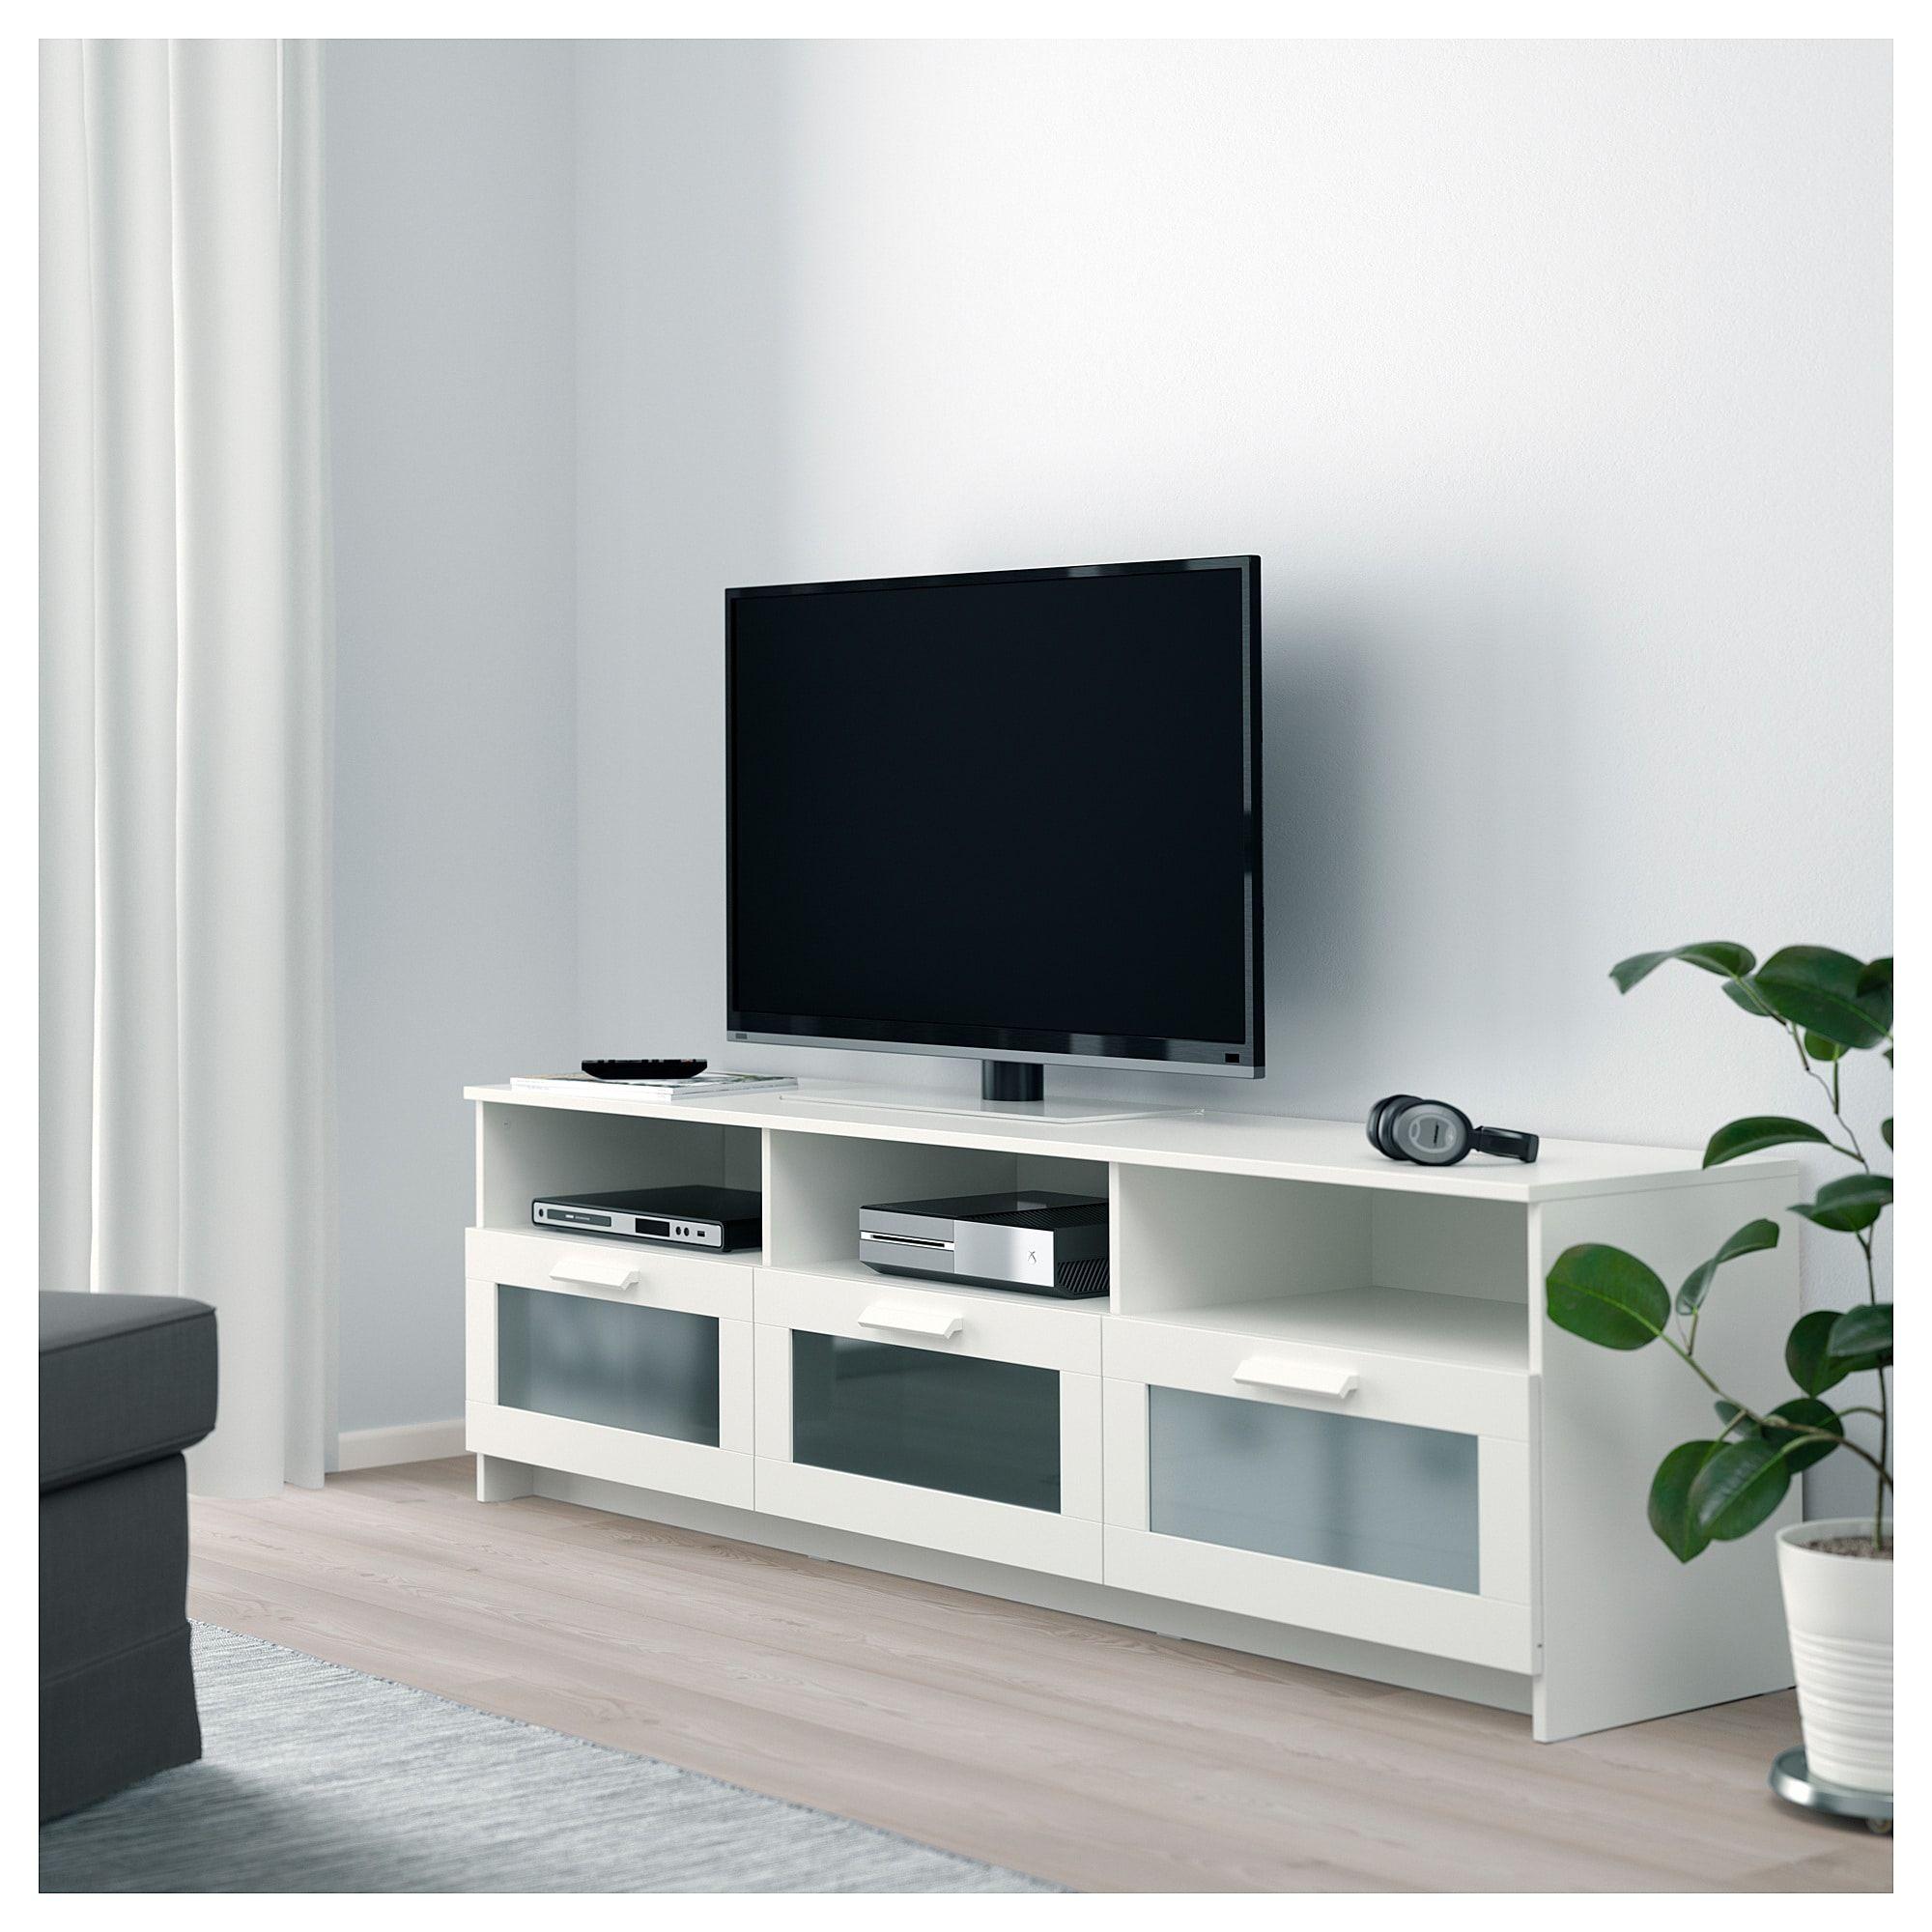 Ikea Countertop White Brimnes In Bench 2019Cute Tv eWYDHIbE29